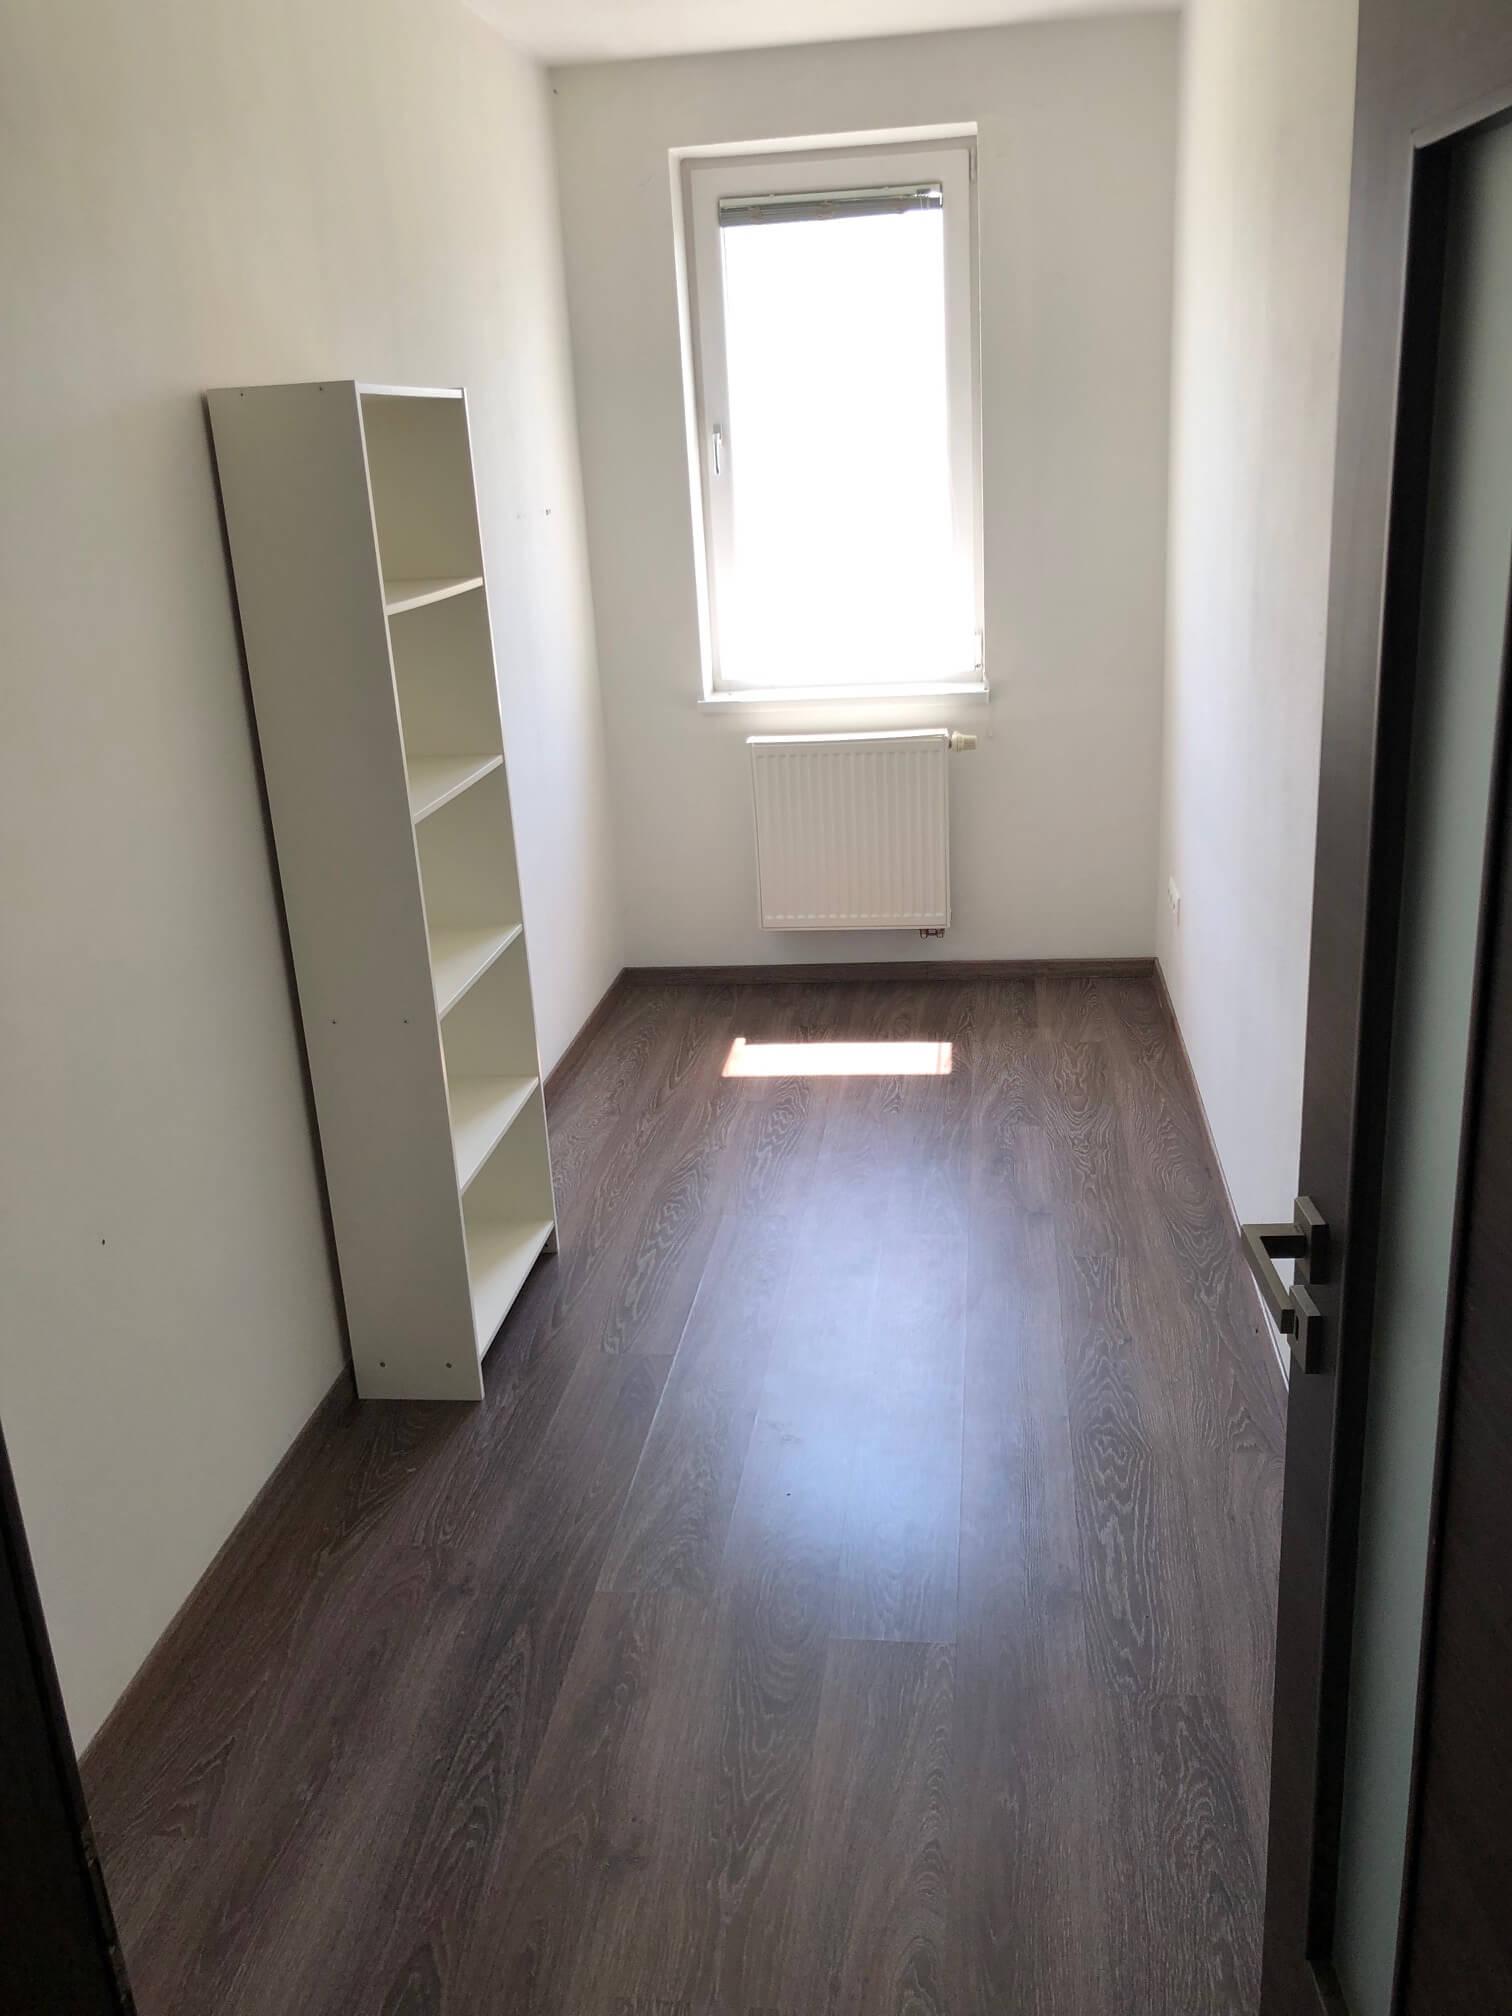 Rezervované: 3 izbový byt, novostavba, 72,25m2, loggia 4,82m2, Staré Grunty, Karlovka, garážové státie-37